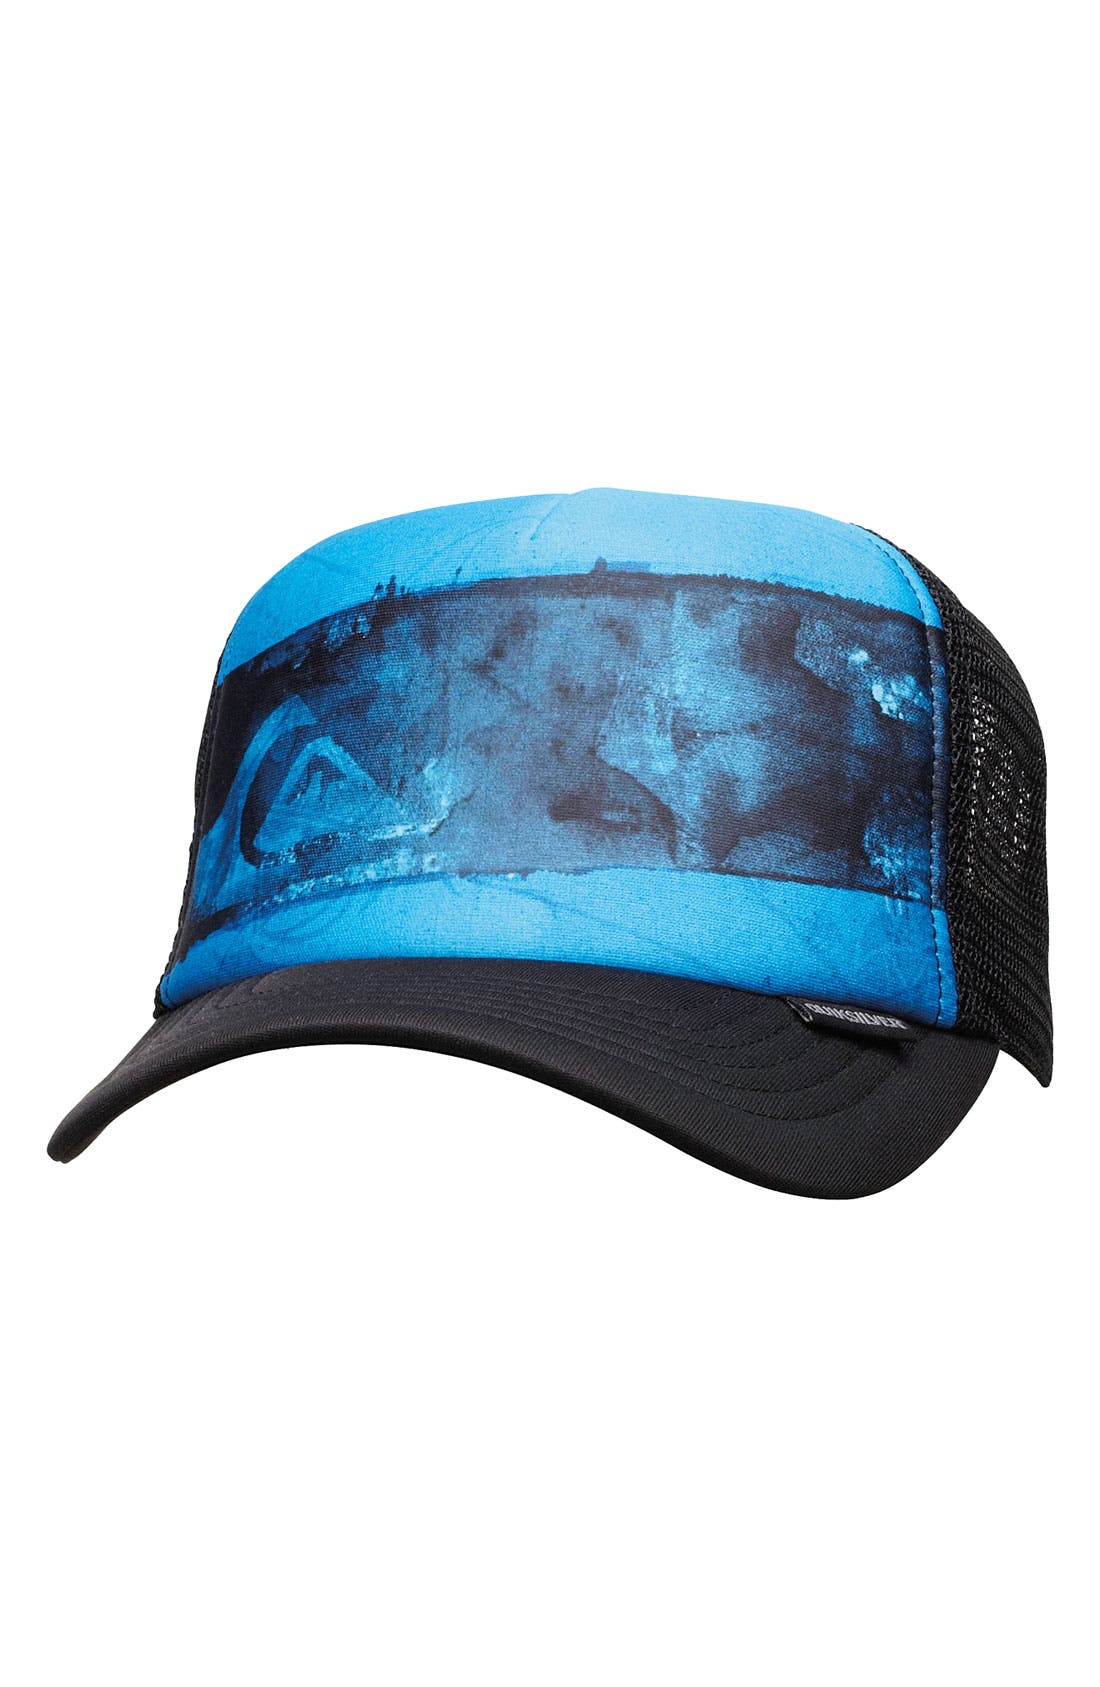 Main Image - Quiksilver 'Boards' Trucker Hat (Big Boys)